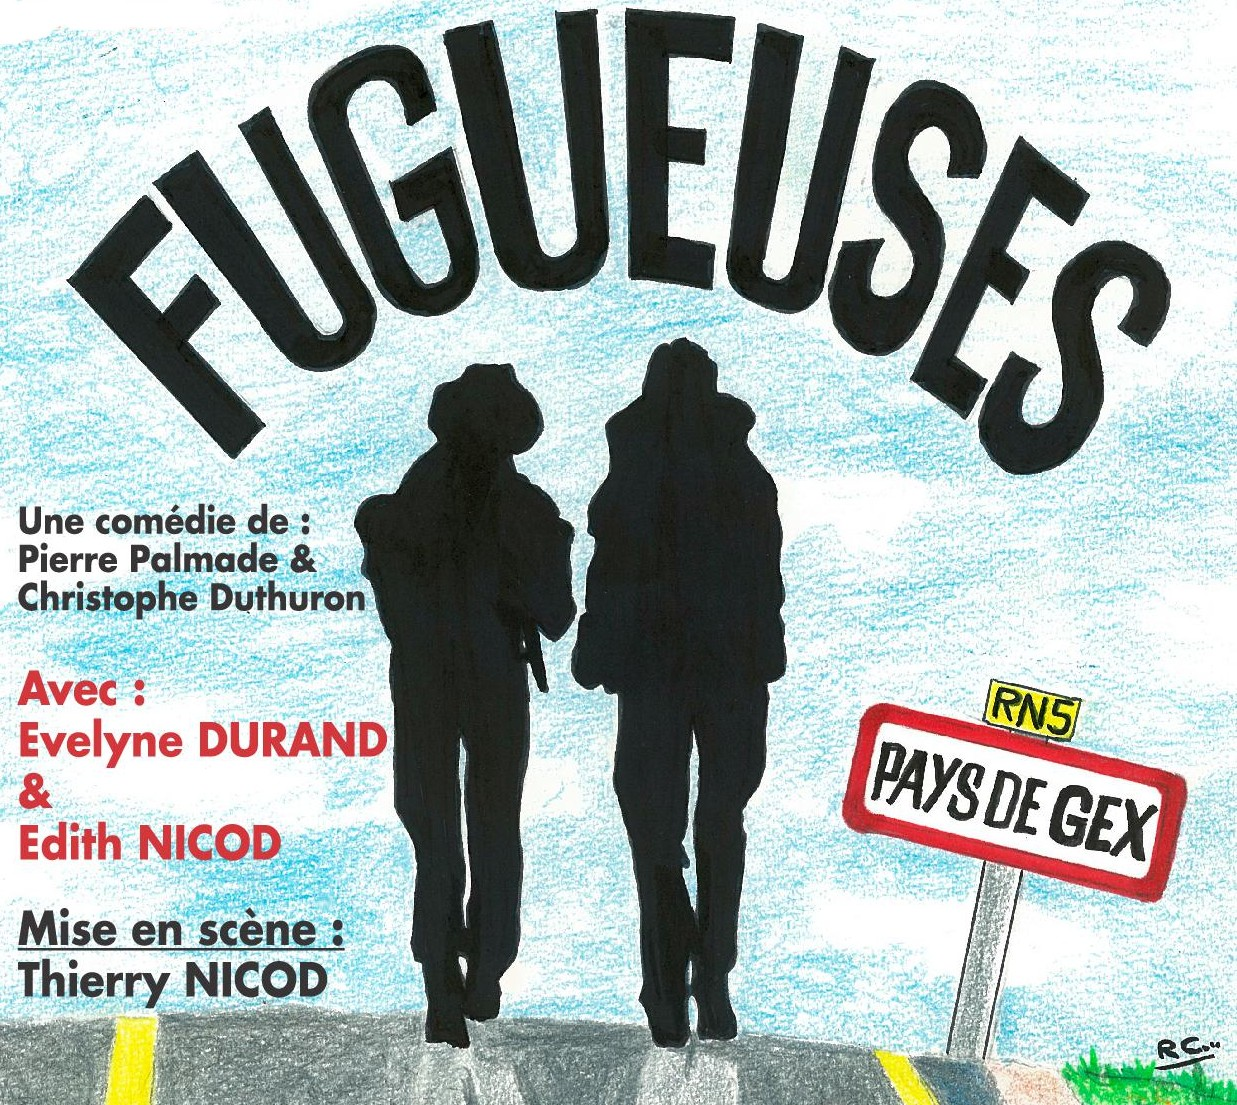 Fugueuses - Le Quart d'Heure Gessien